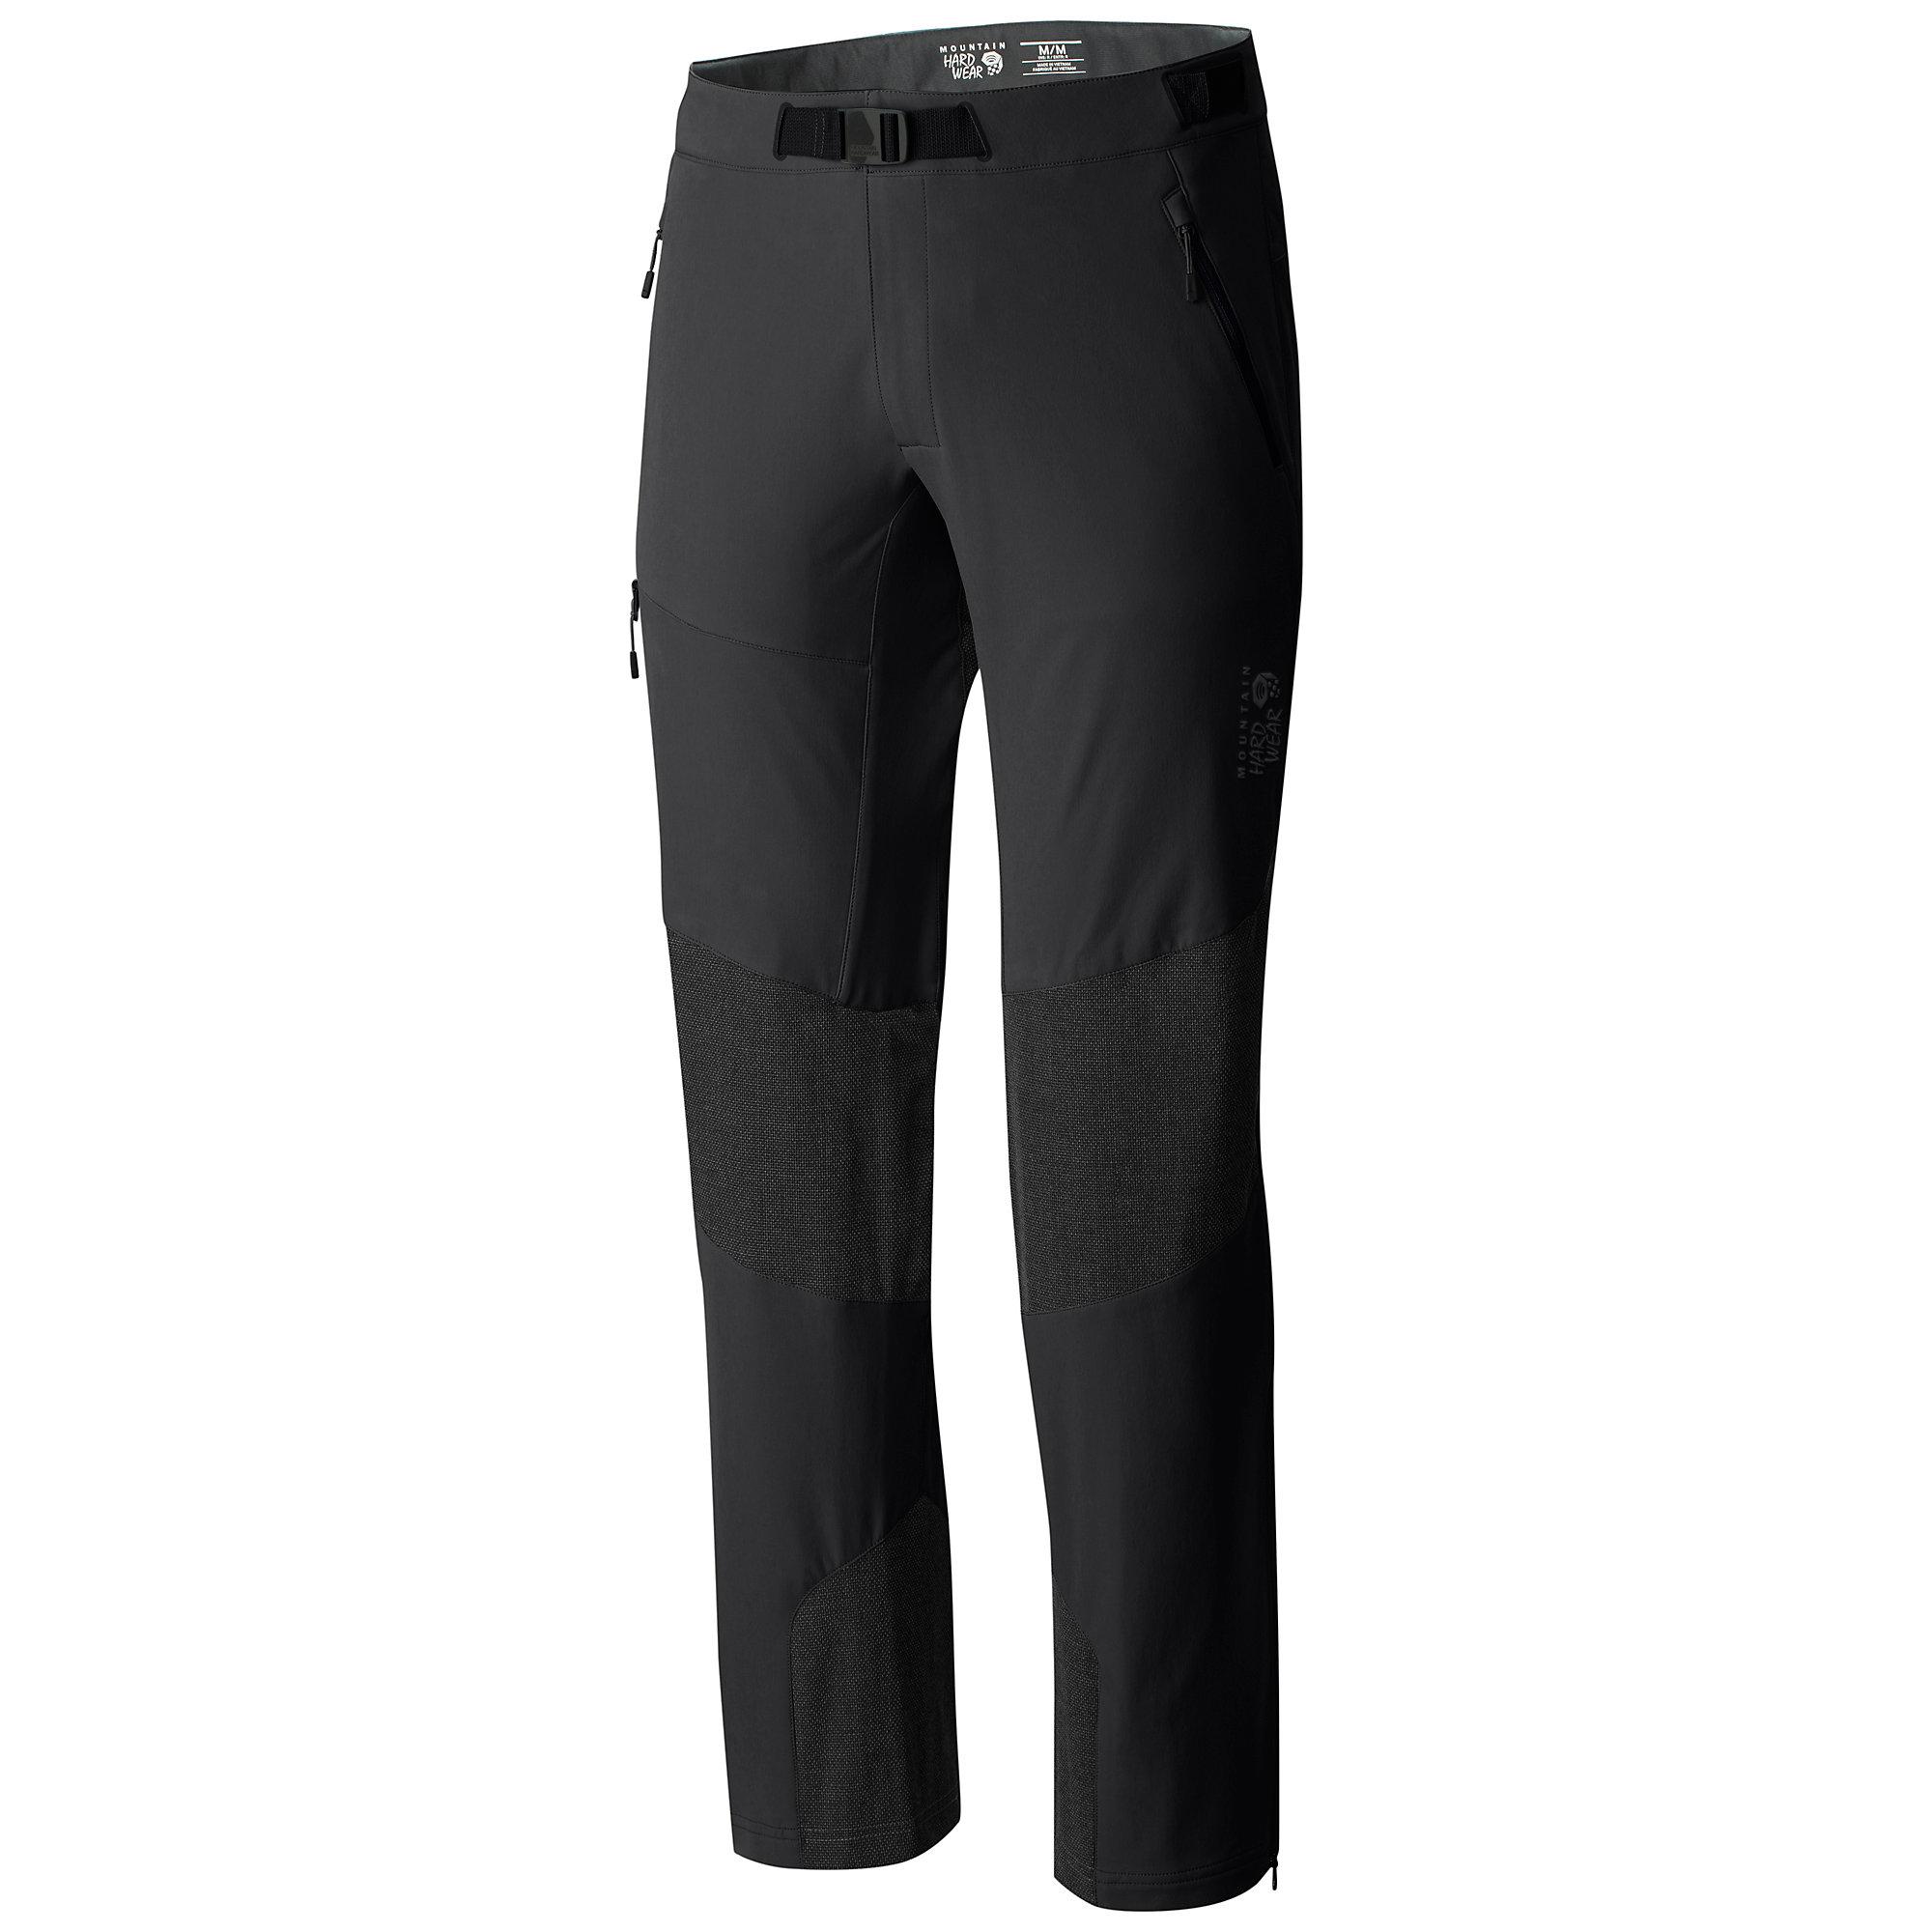 Mountain Hardwear Dragon Pant